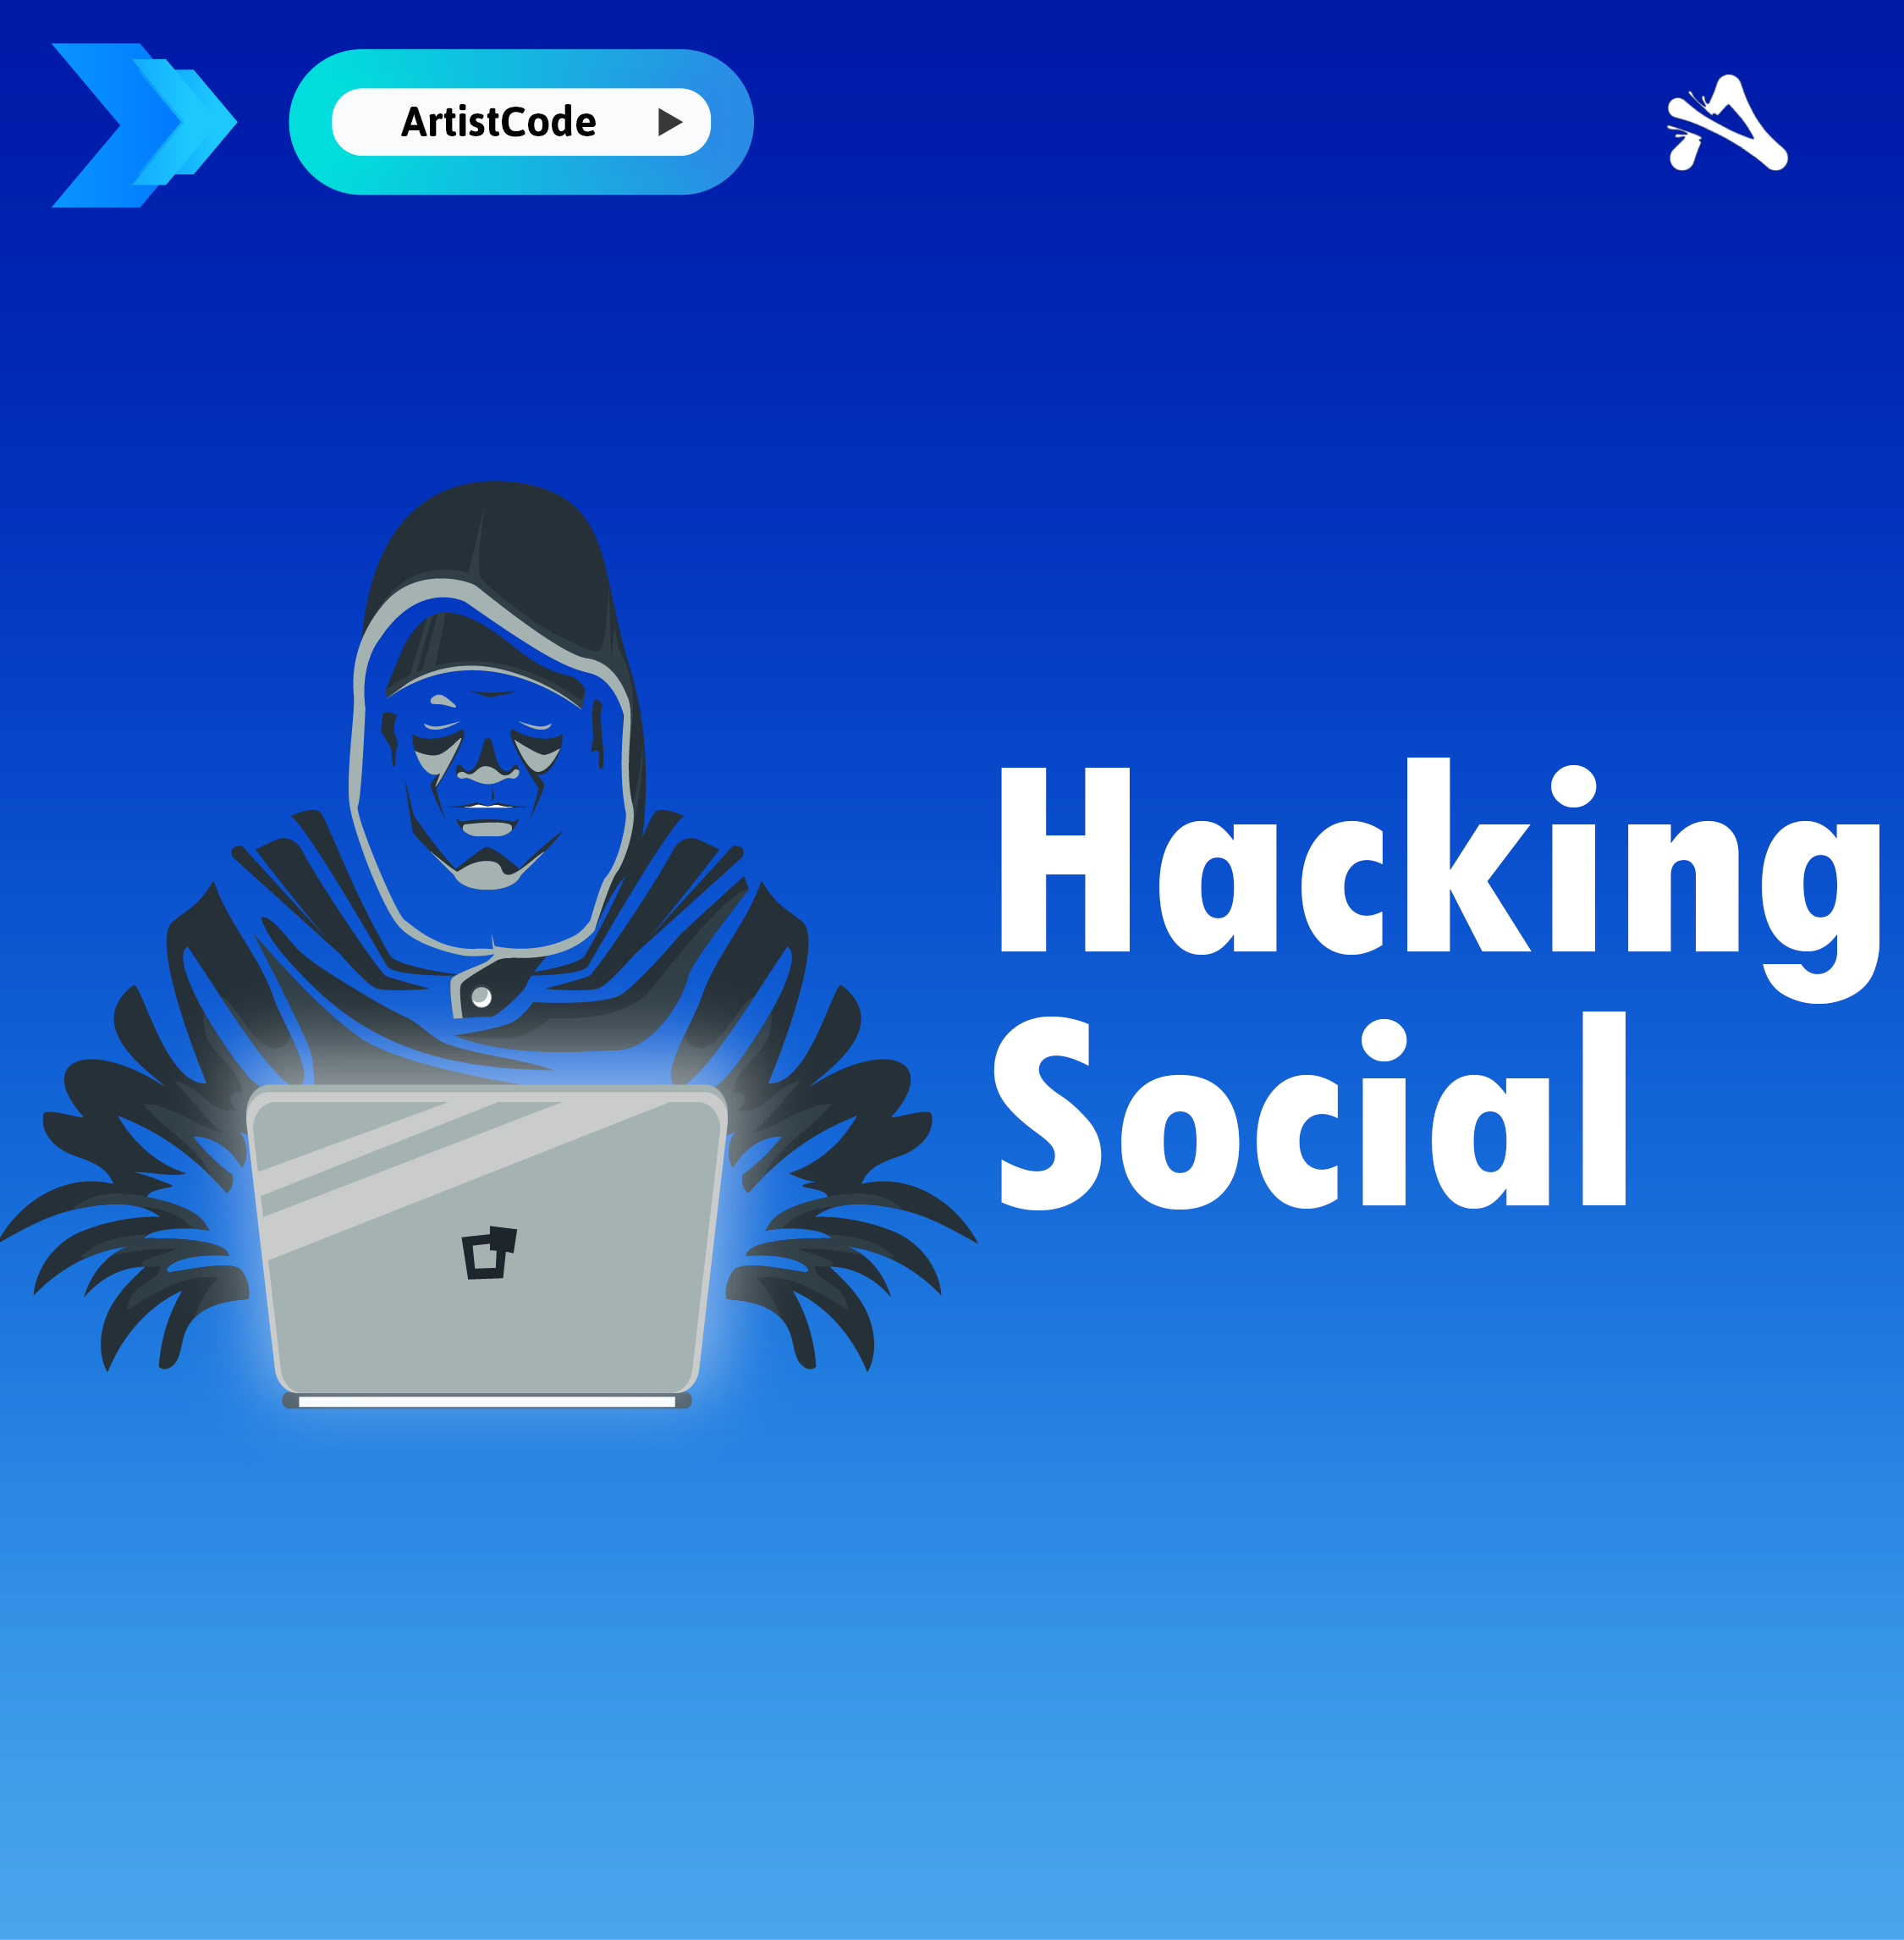 Hacking Social